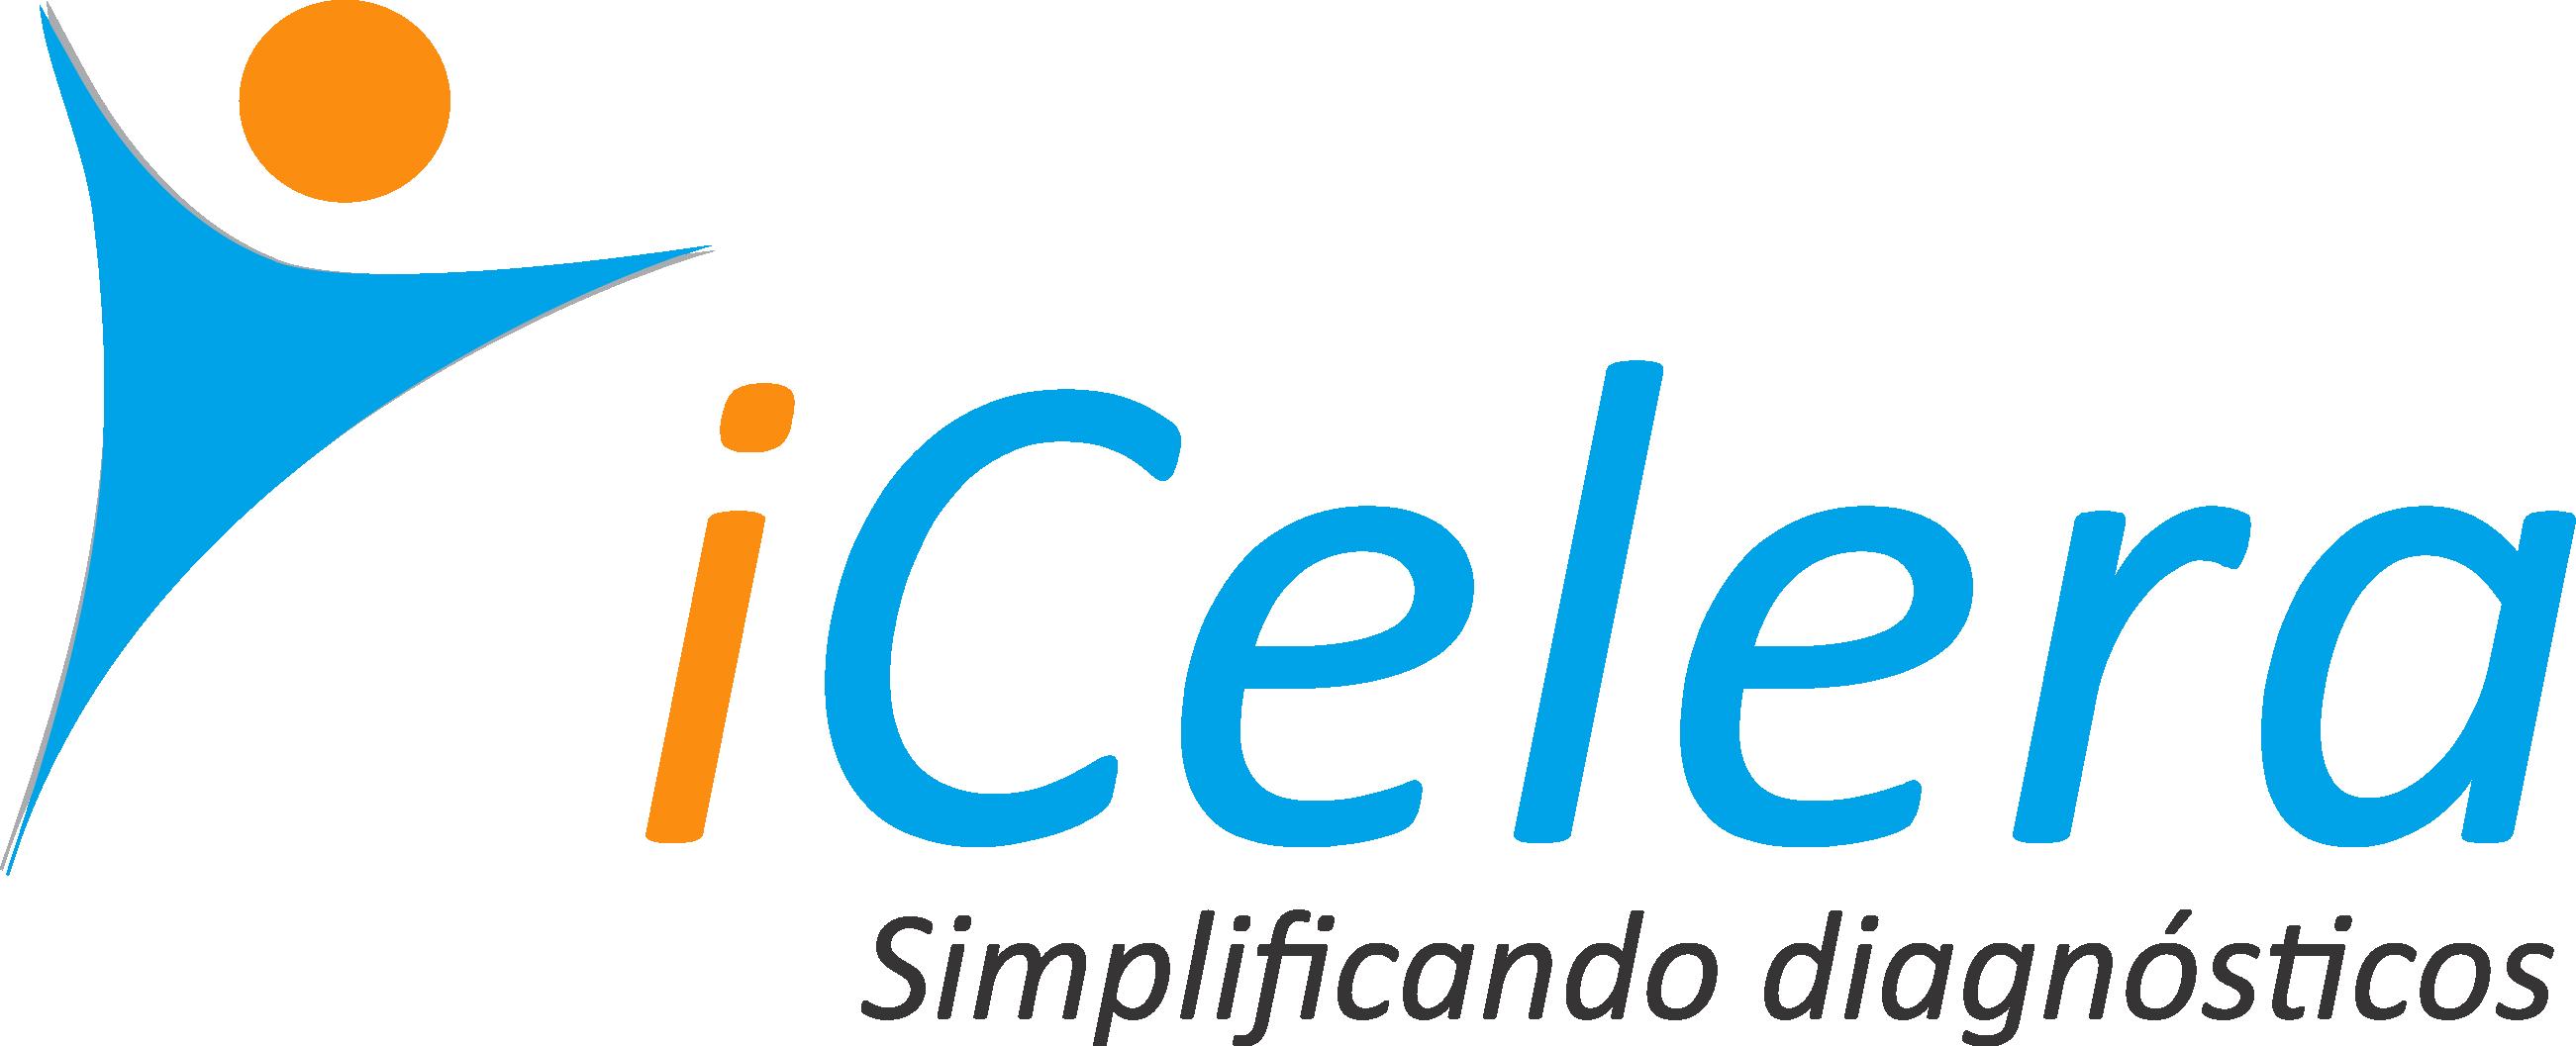 Icelera